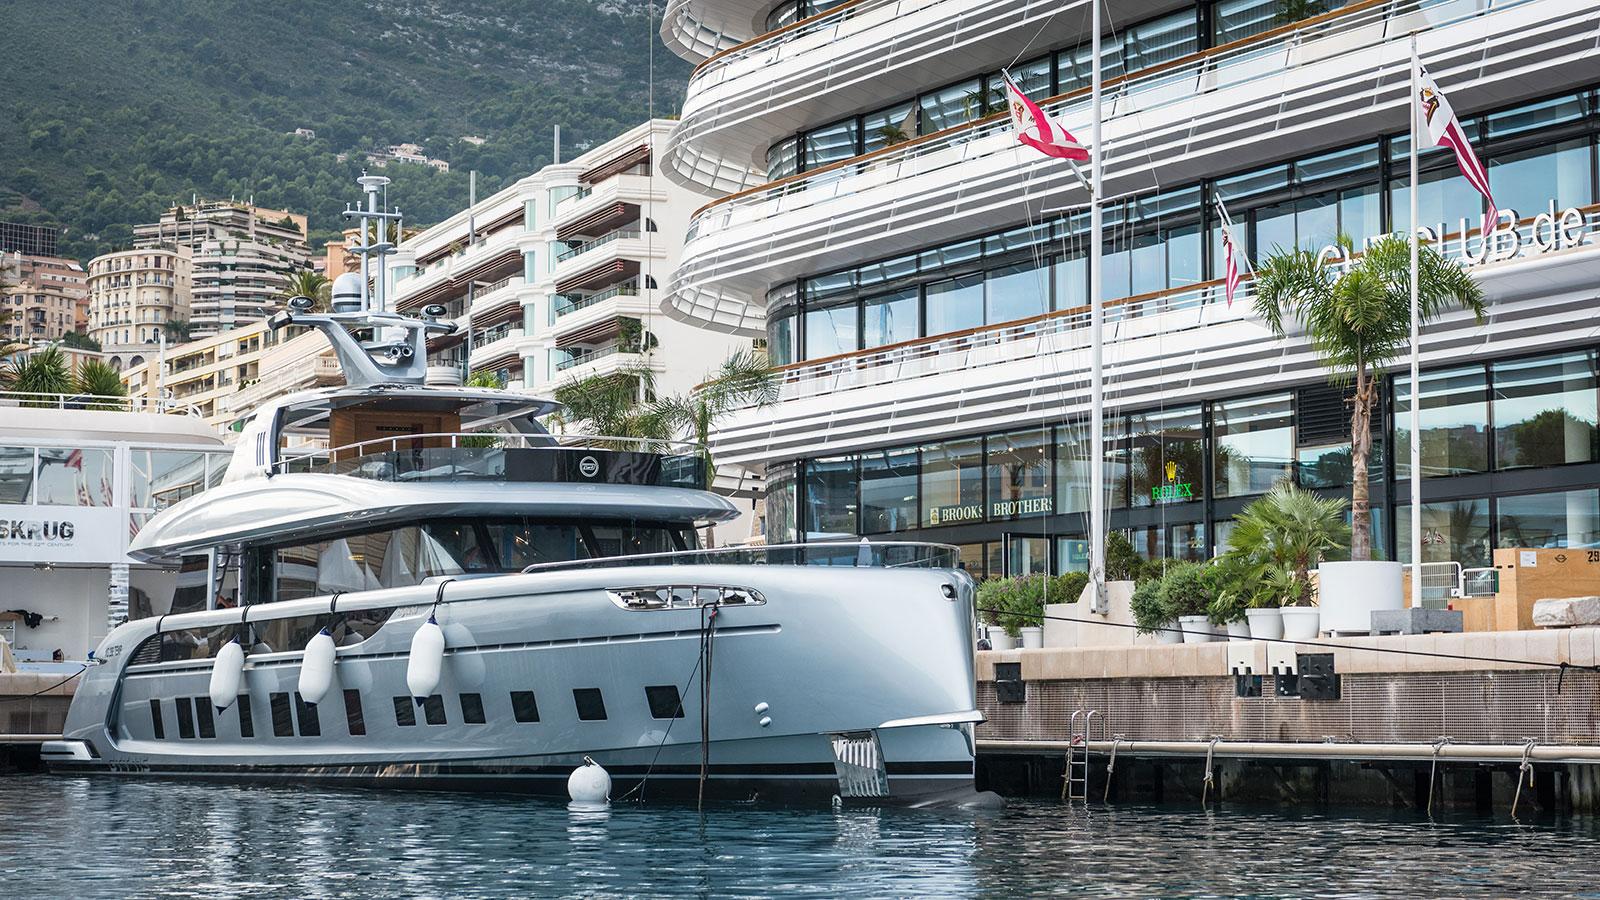 the-porsch-designed-yacht-dynamiq-gtt-115-made-its-public-debut-at-the-monaco-yacht-show-2017